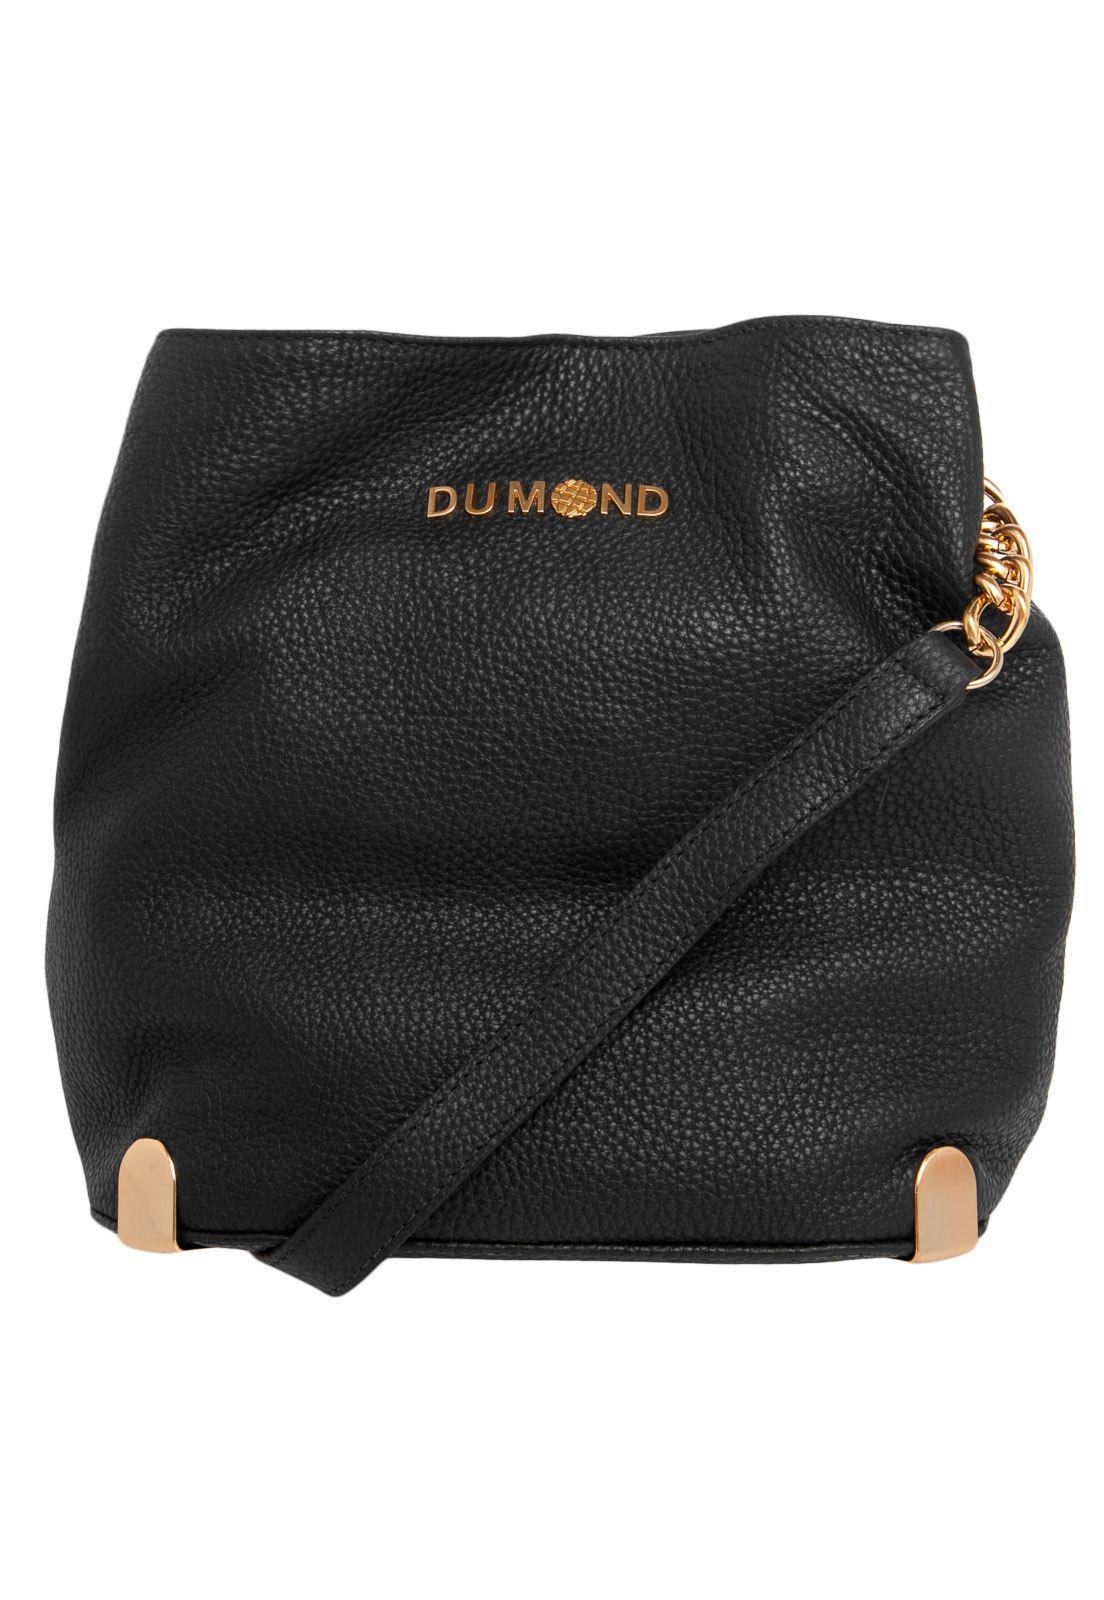 b478730d4 Bolsa Dumond Urban Preta | Acessorios | Fashion bags, Bags e Fashion